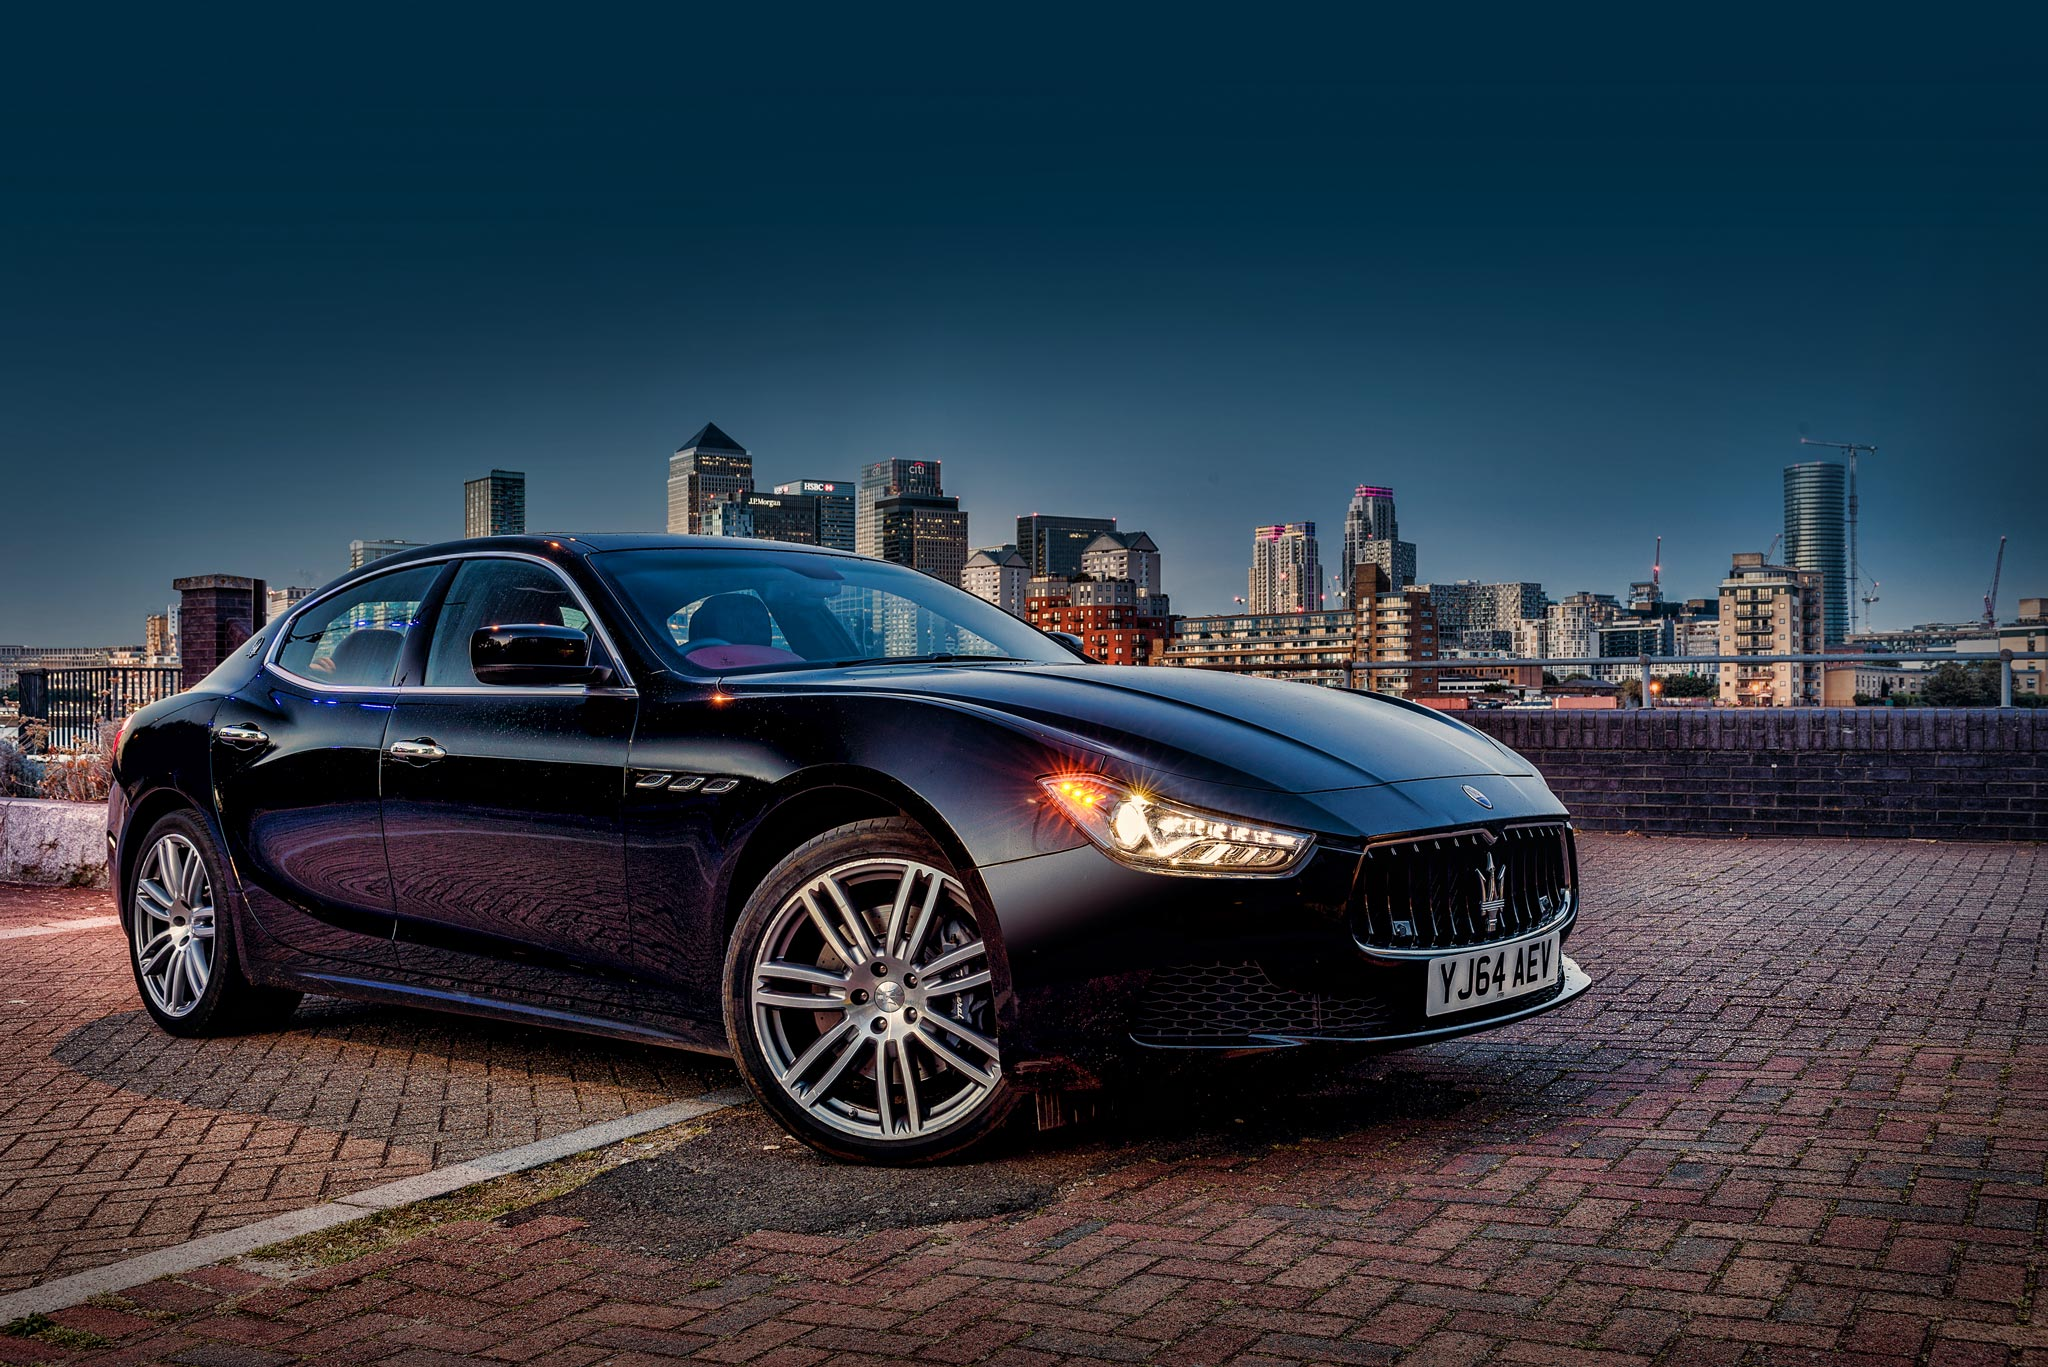 Maserati Ghibli City of London backdrop